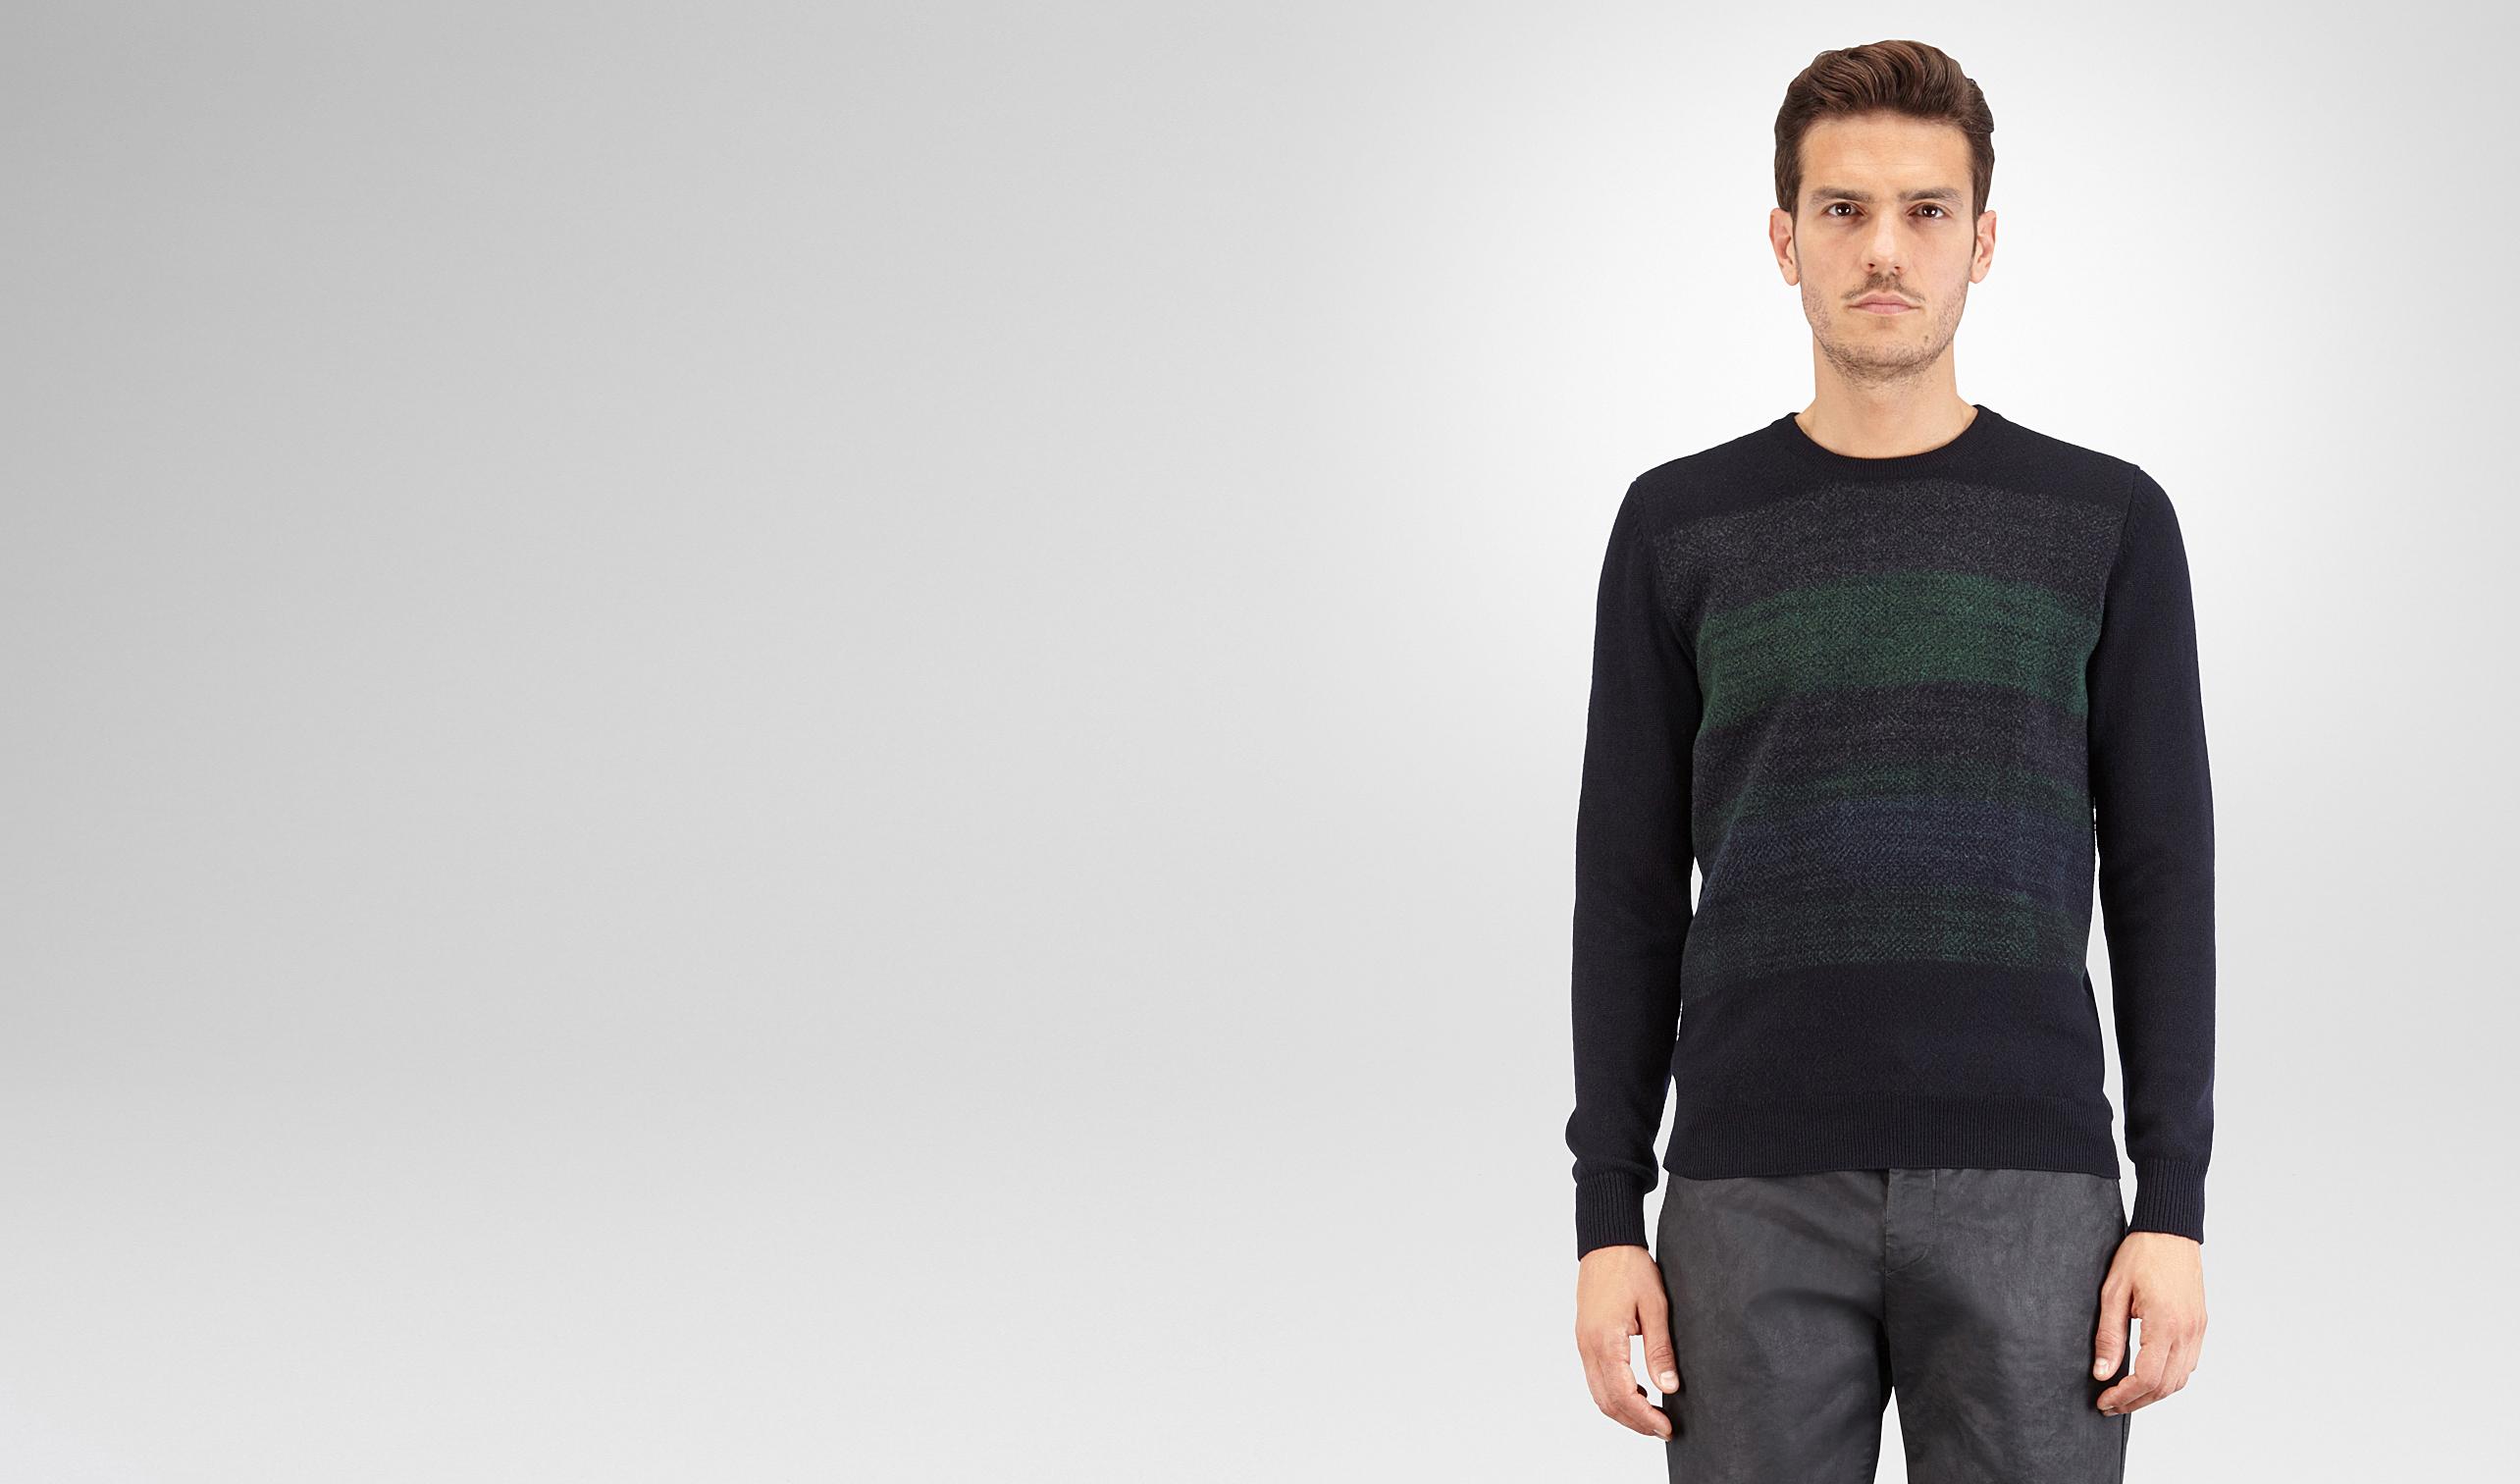 BOTTEGA VENETA Knitwear U SWEATER IN DARK NAVY CASHMERE, MULTICOLOR NEEDLE PUNCH DETAILS pl